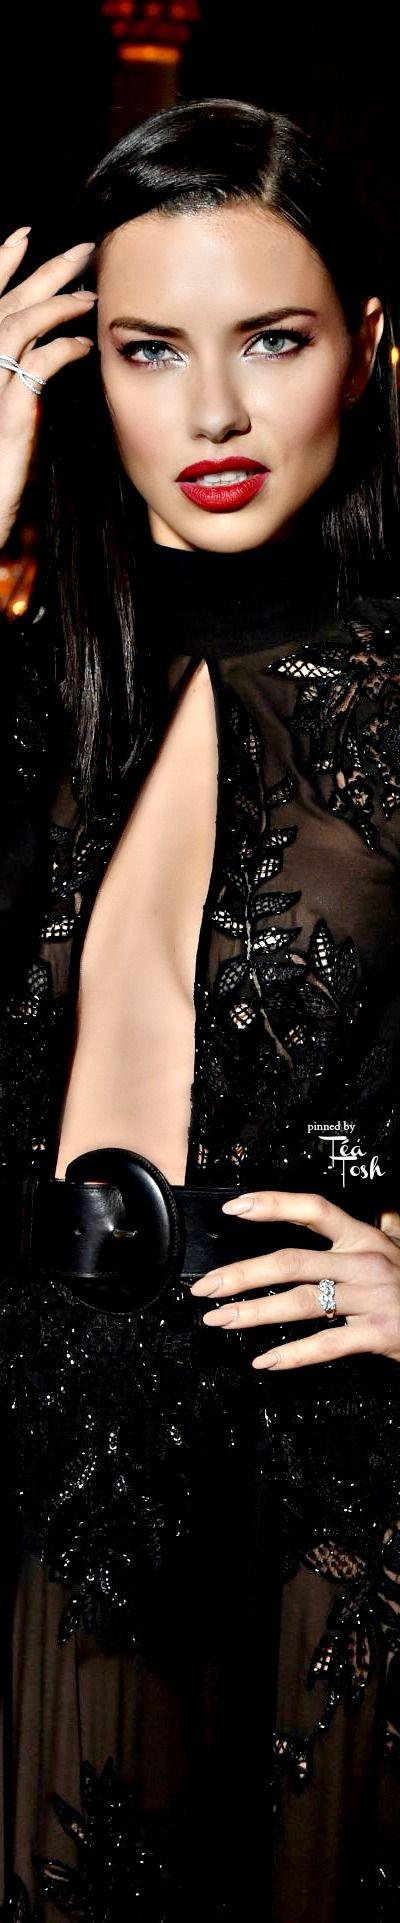 ❇Téa Tosh❇ Adriana Lima at amfAR New York Gala Red Carpet